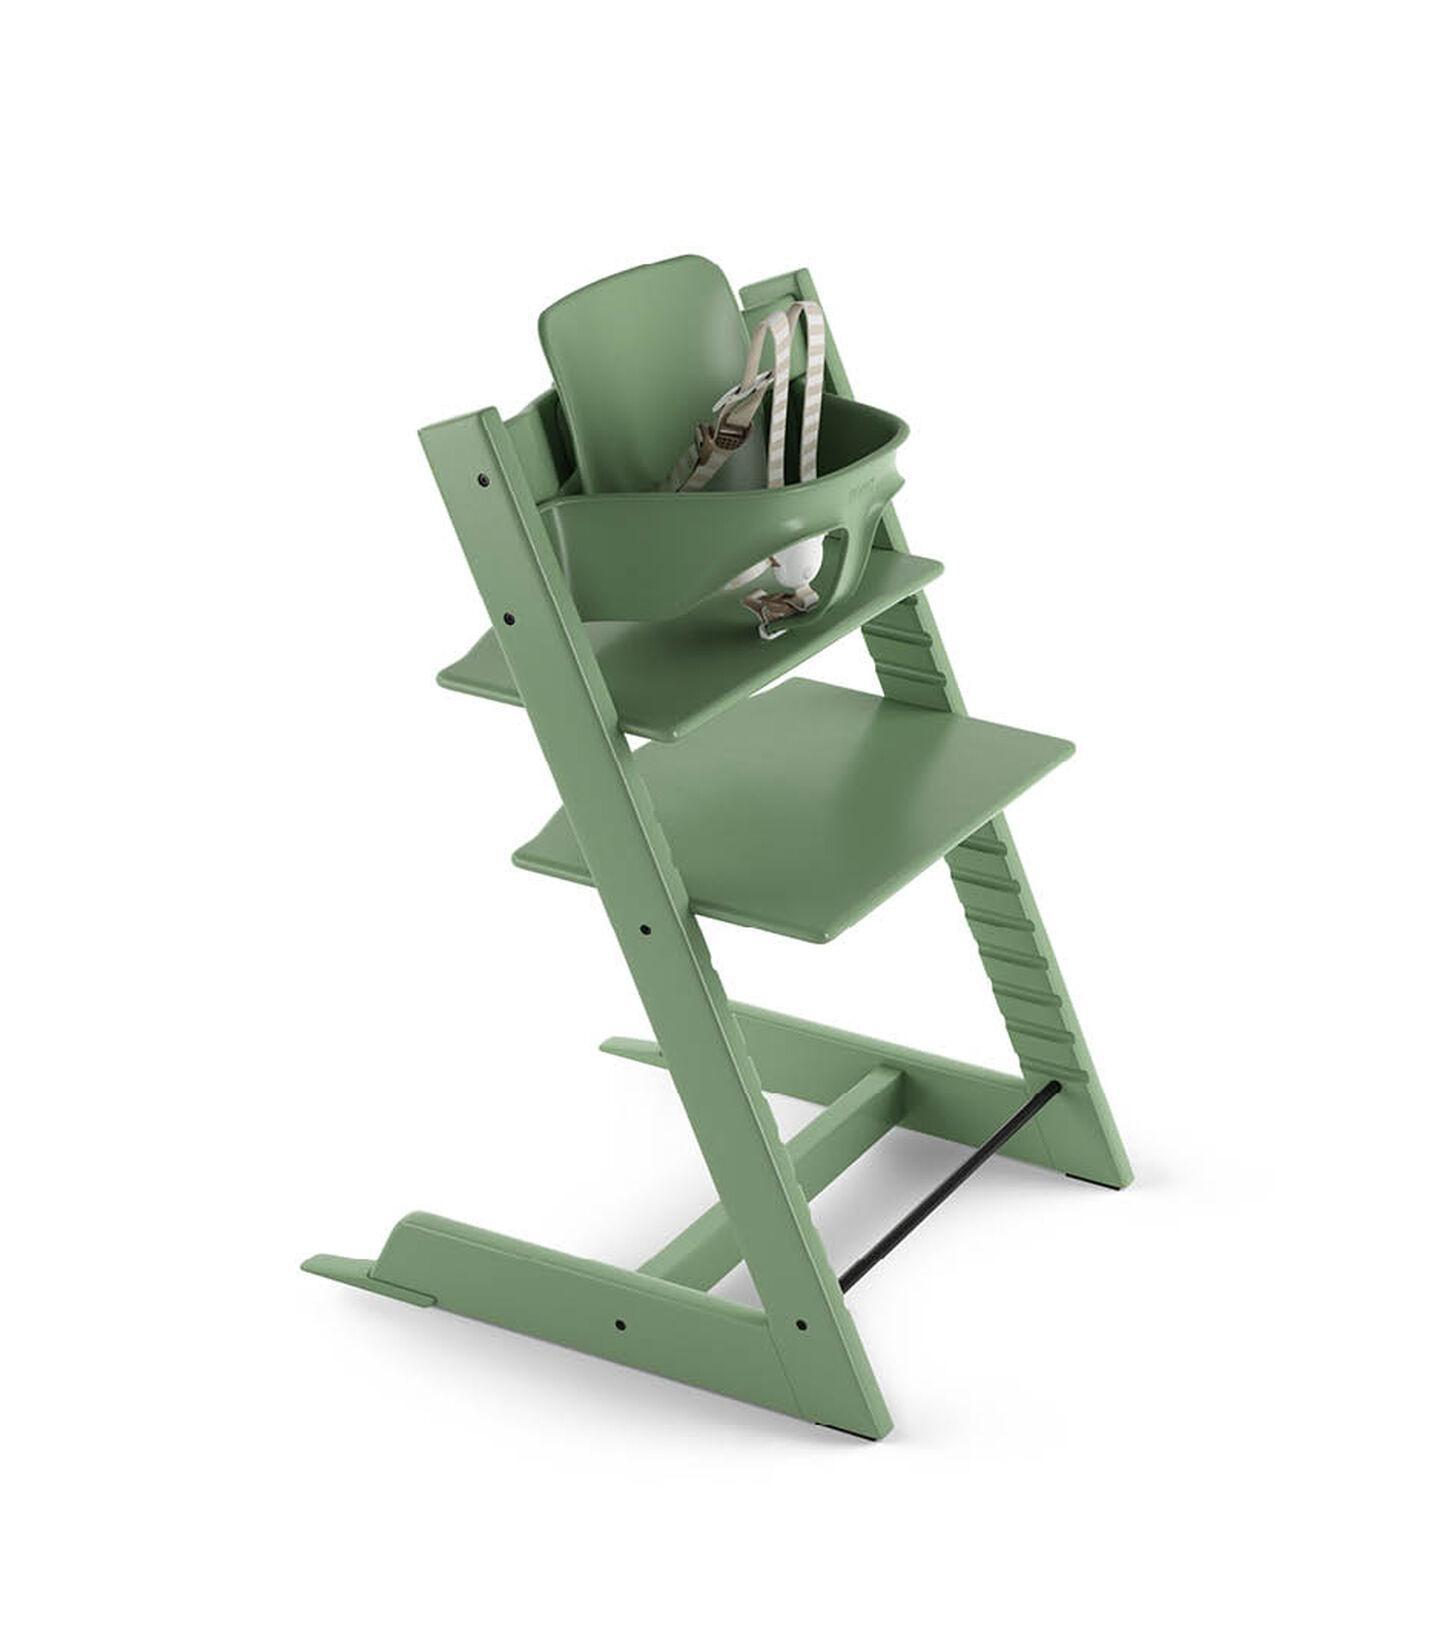 Tripp Trapp® Bundle High Chair US 18 Moss Green, Moss Green, mainview view 1